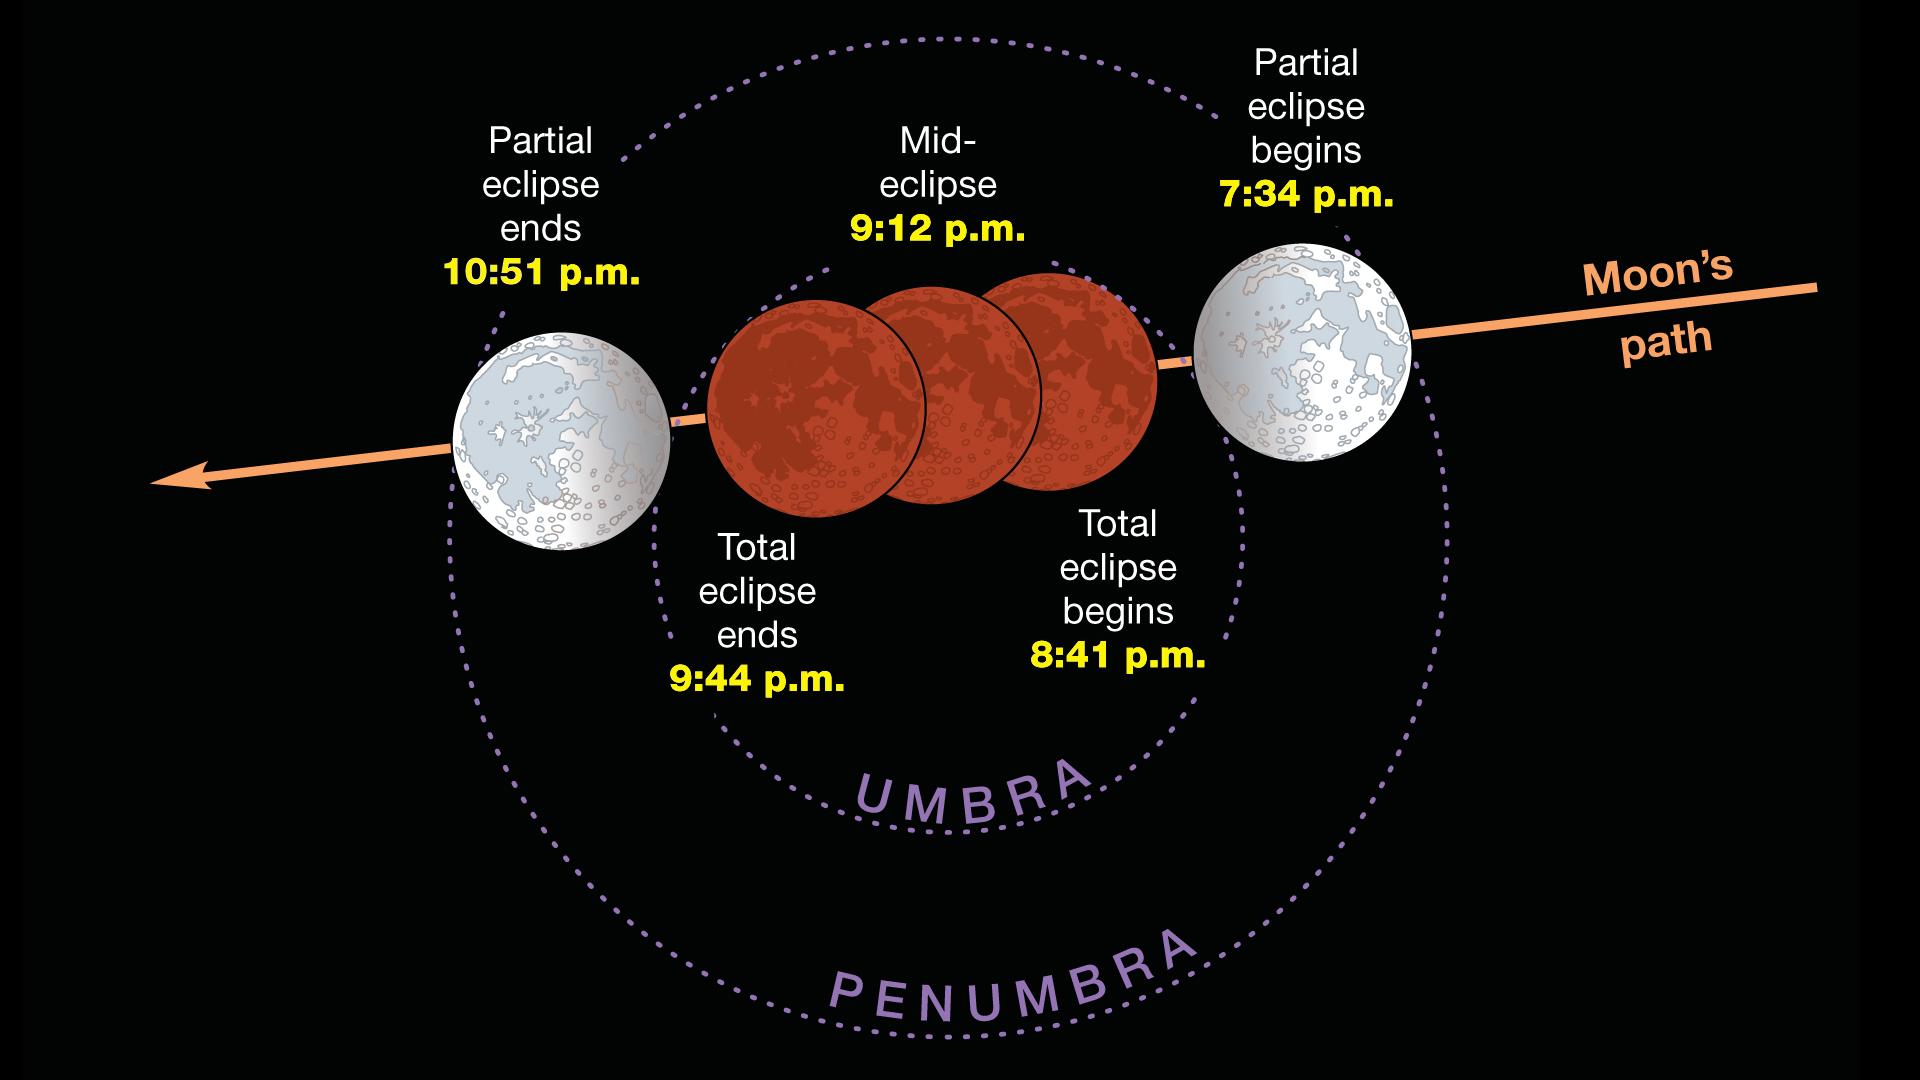 Jan 2019 lunar eclipse HD PST